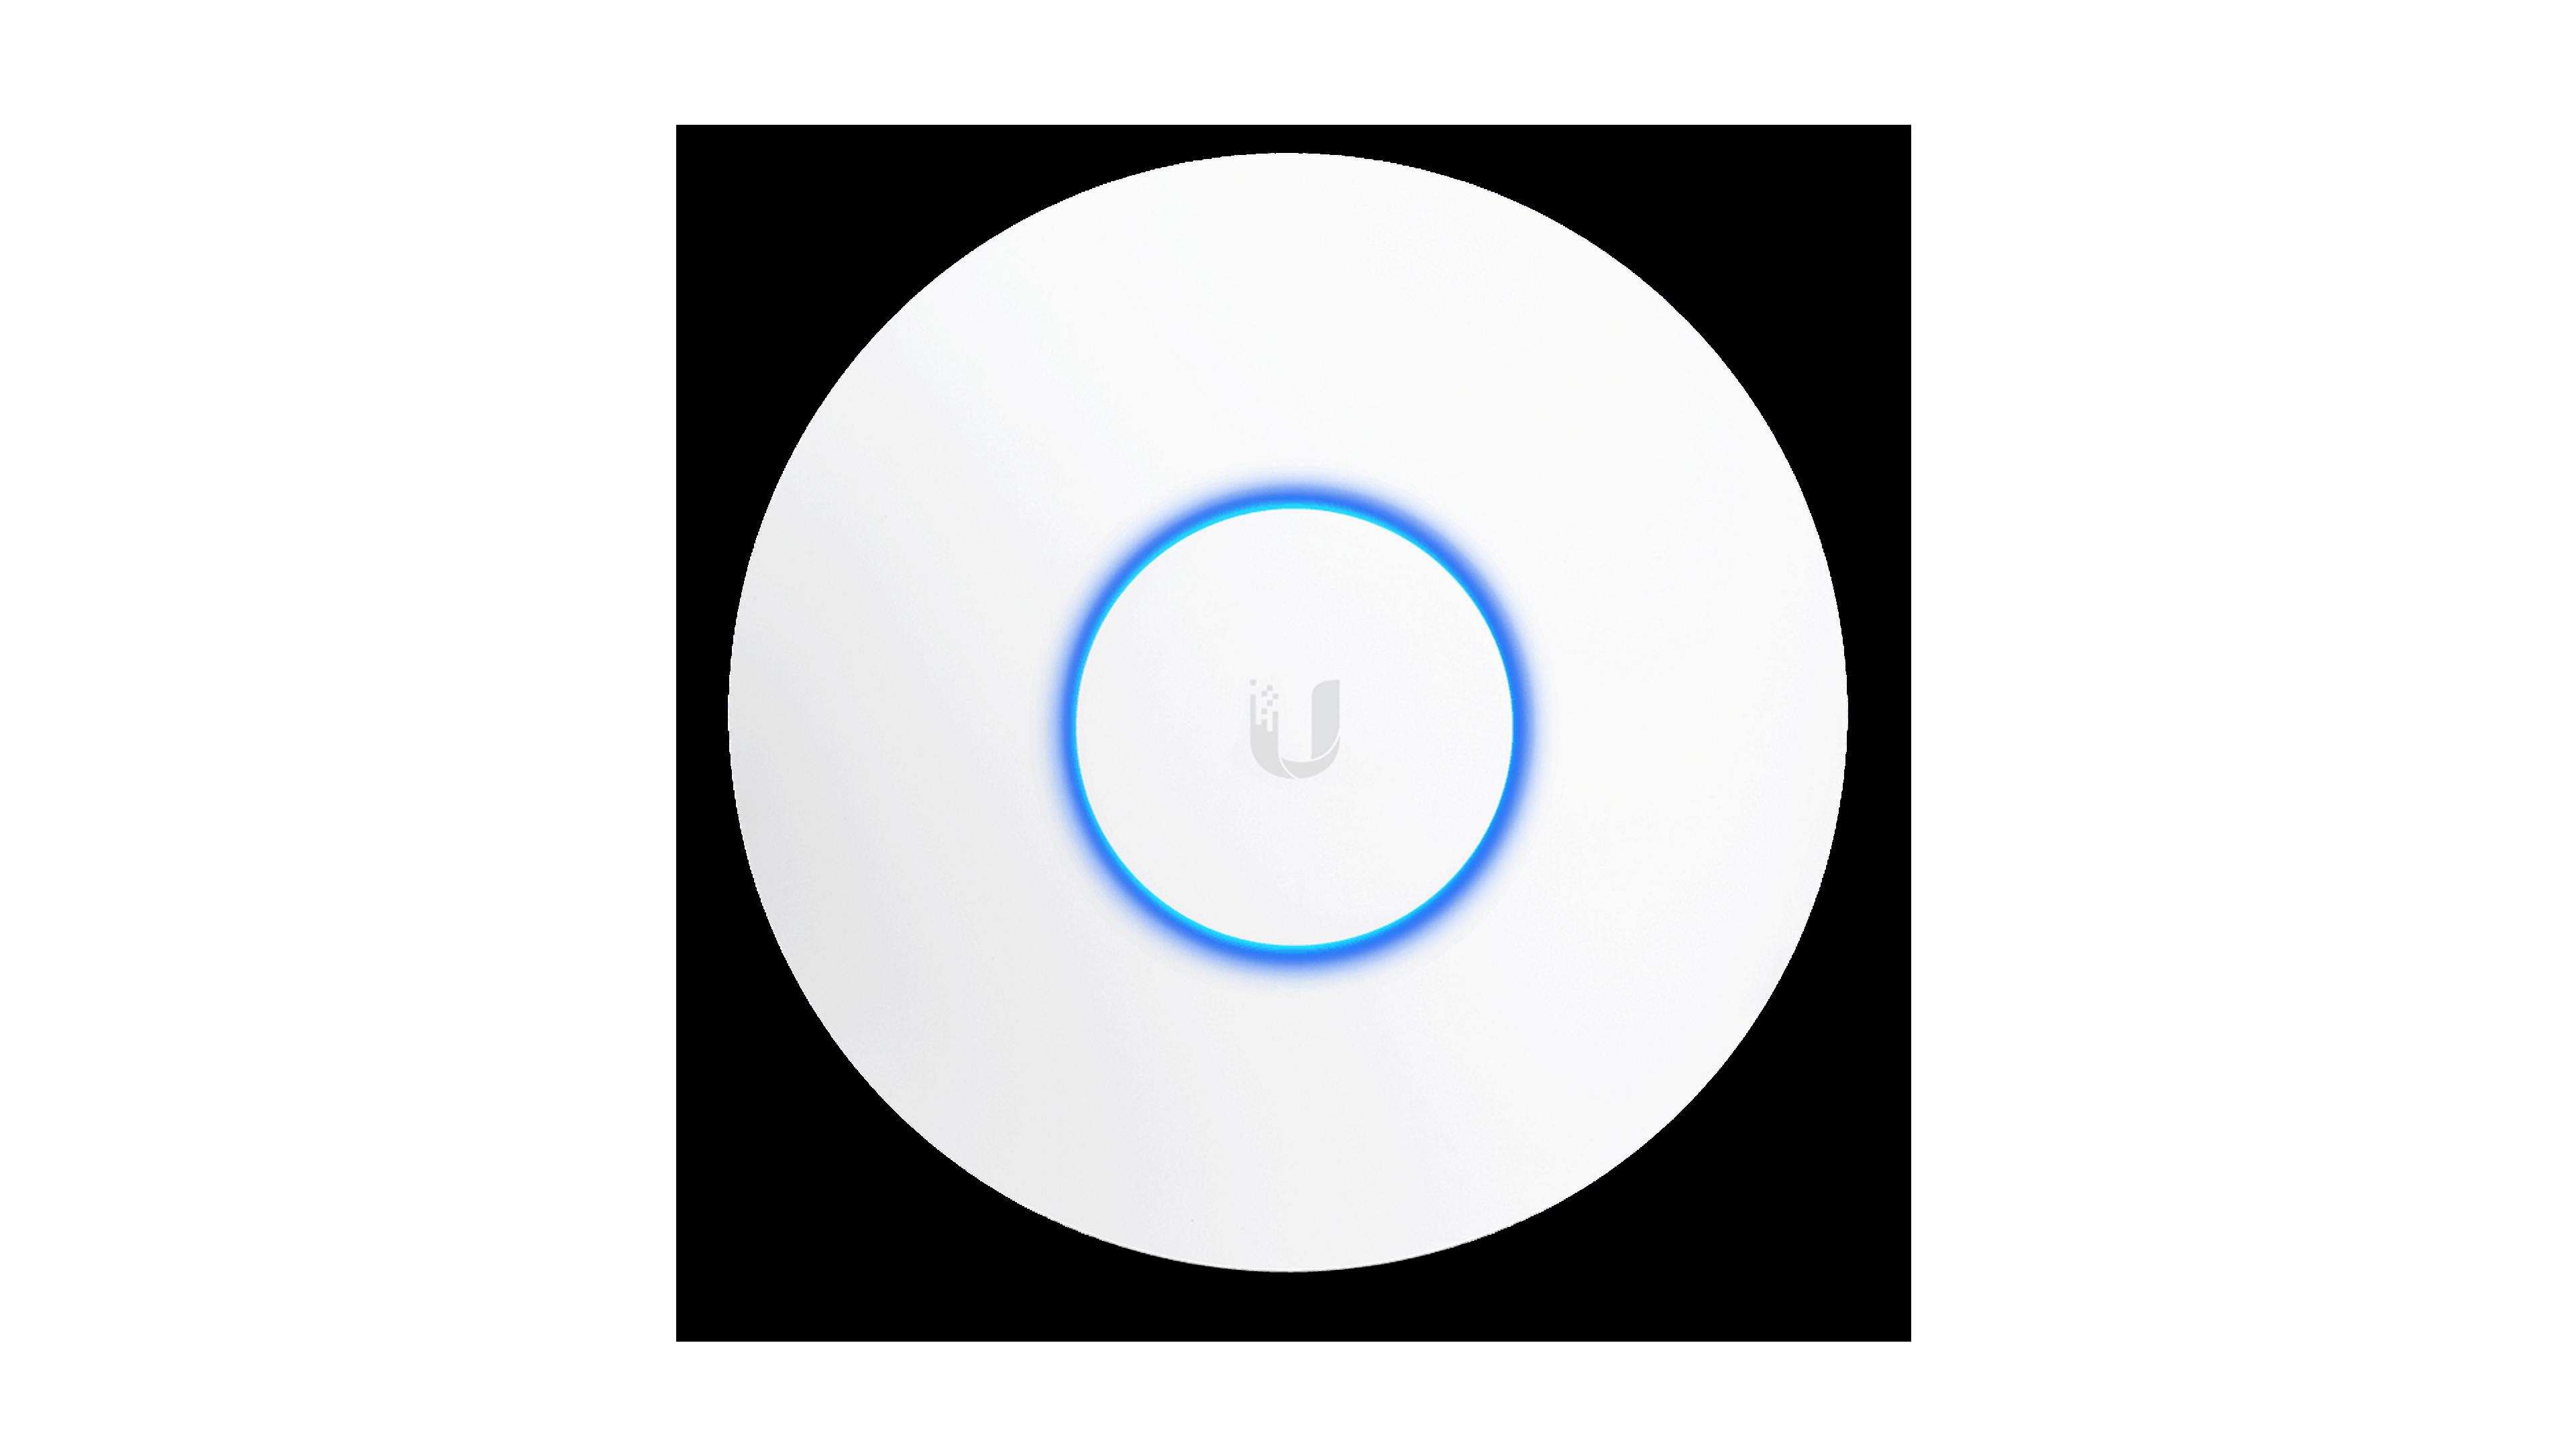 Ubiquiti Networks Uap Ac Pro Us Unifi Access Point Enterprise Wi Fi System Ubiquitinetworks Wifi